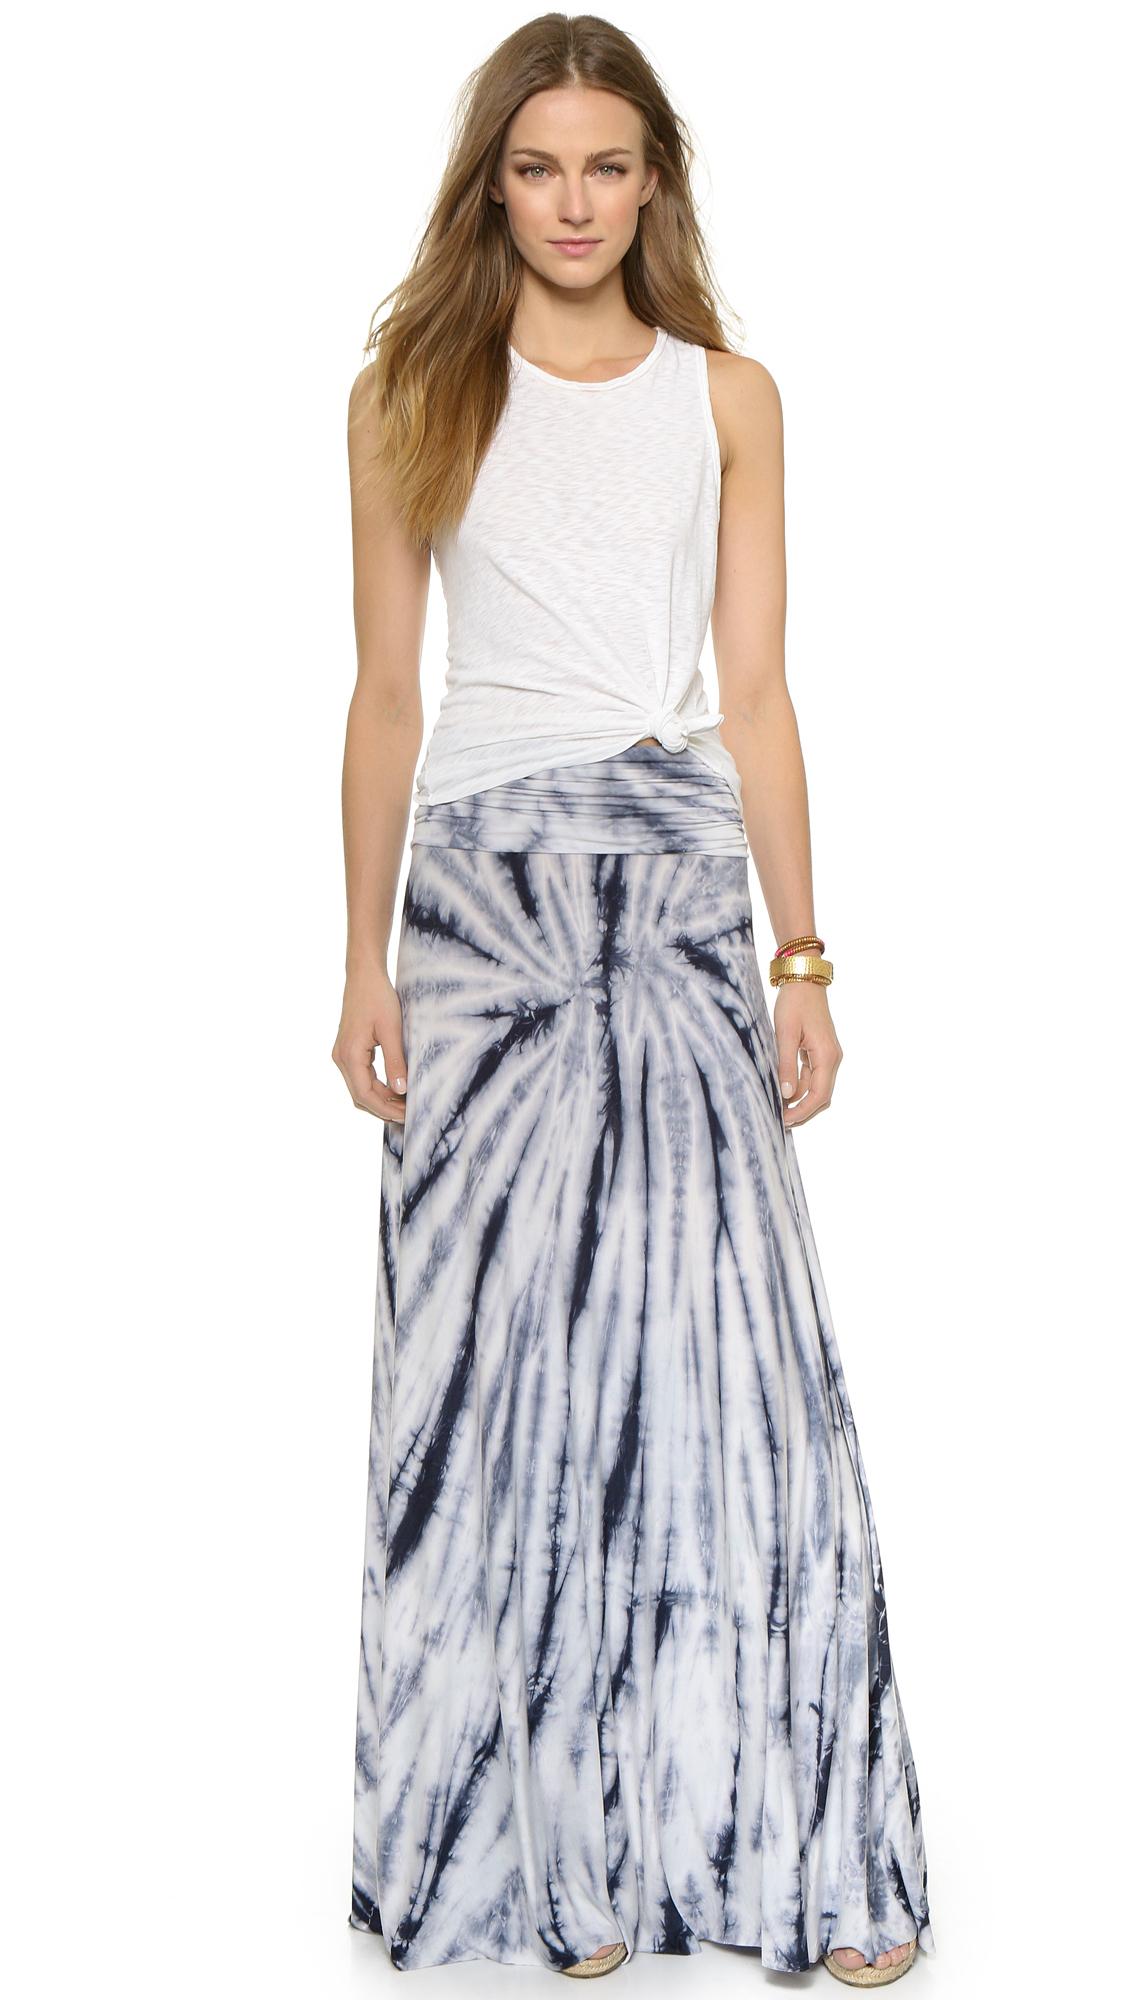 95754b374 Lyst - Young Fabulous & Broke Bangal Maxi Dress / Skirt - Grey ...